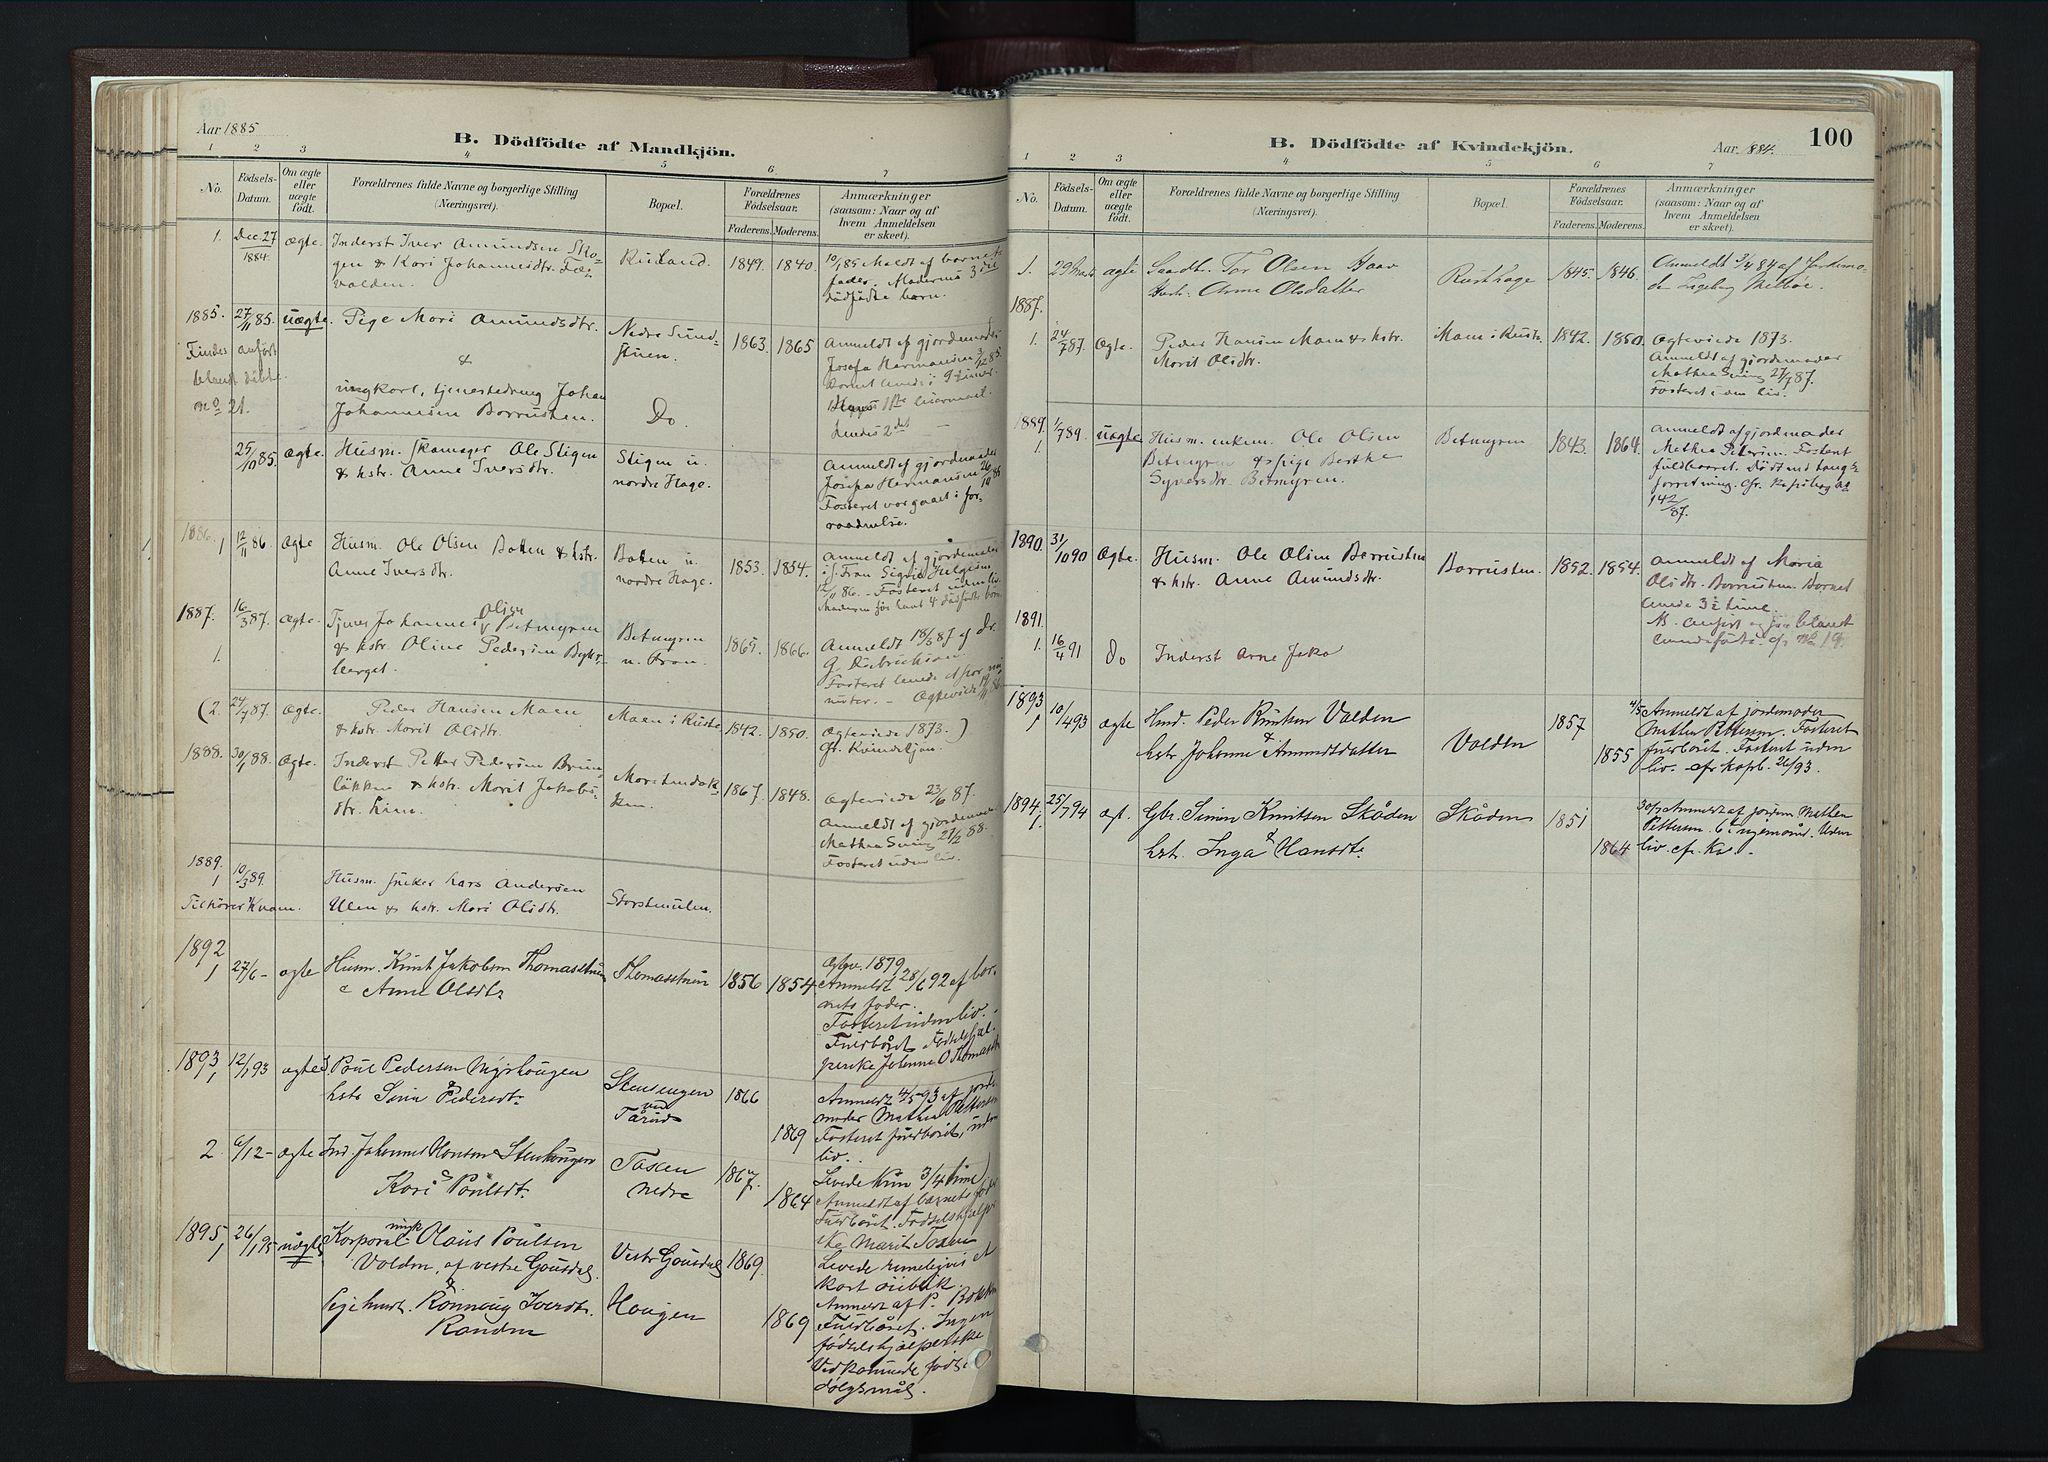 SAH, Nord-Fron prestekontor, Ministerialbok nr. 4, 1884-1914, s. 100